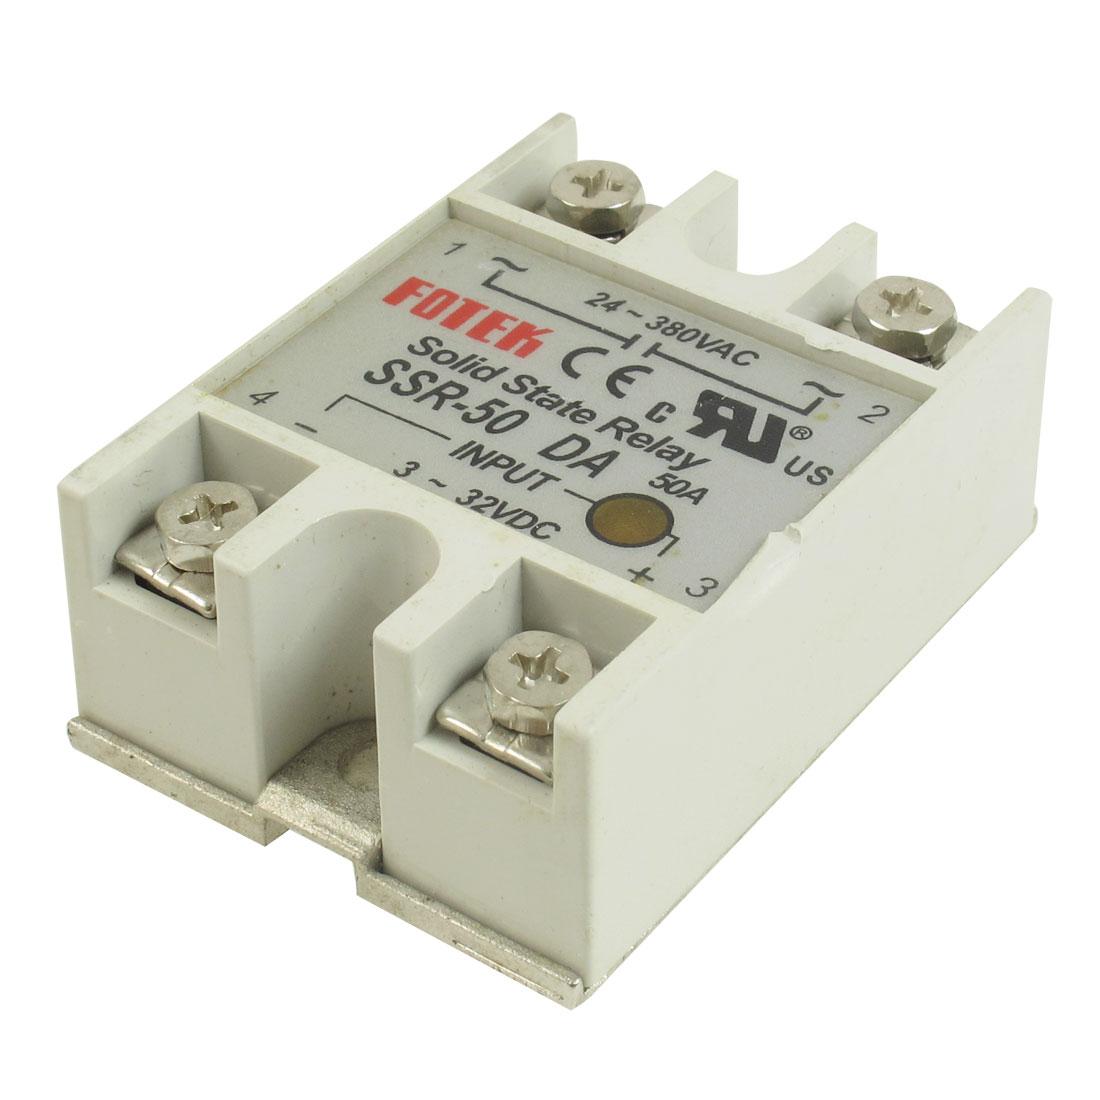 Solid State Relay SSR-50DA 50A /250V Input 3-32VDC Output 24-380VAC